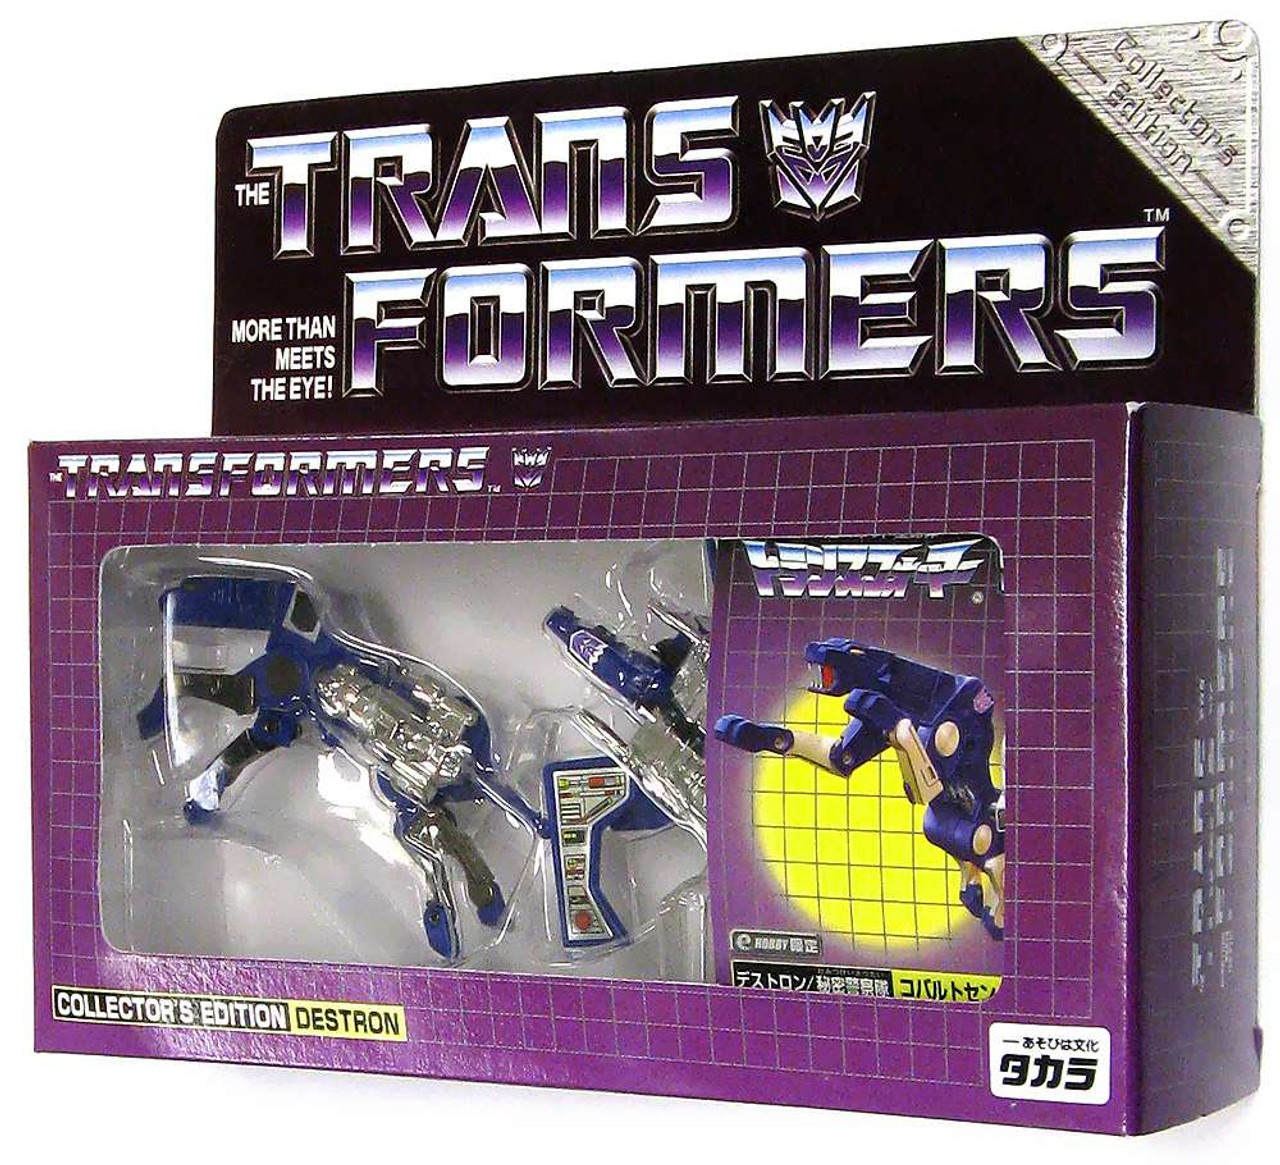 Transformers Japanese Collector's Edition Destron Cobalt Sentry Cassettes Action Figure Set [Howlback & Garboil]